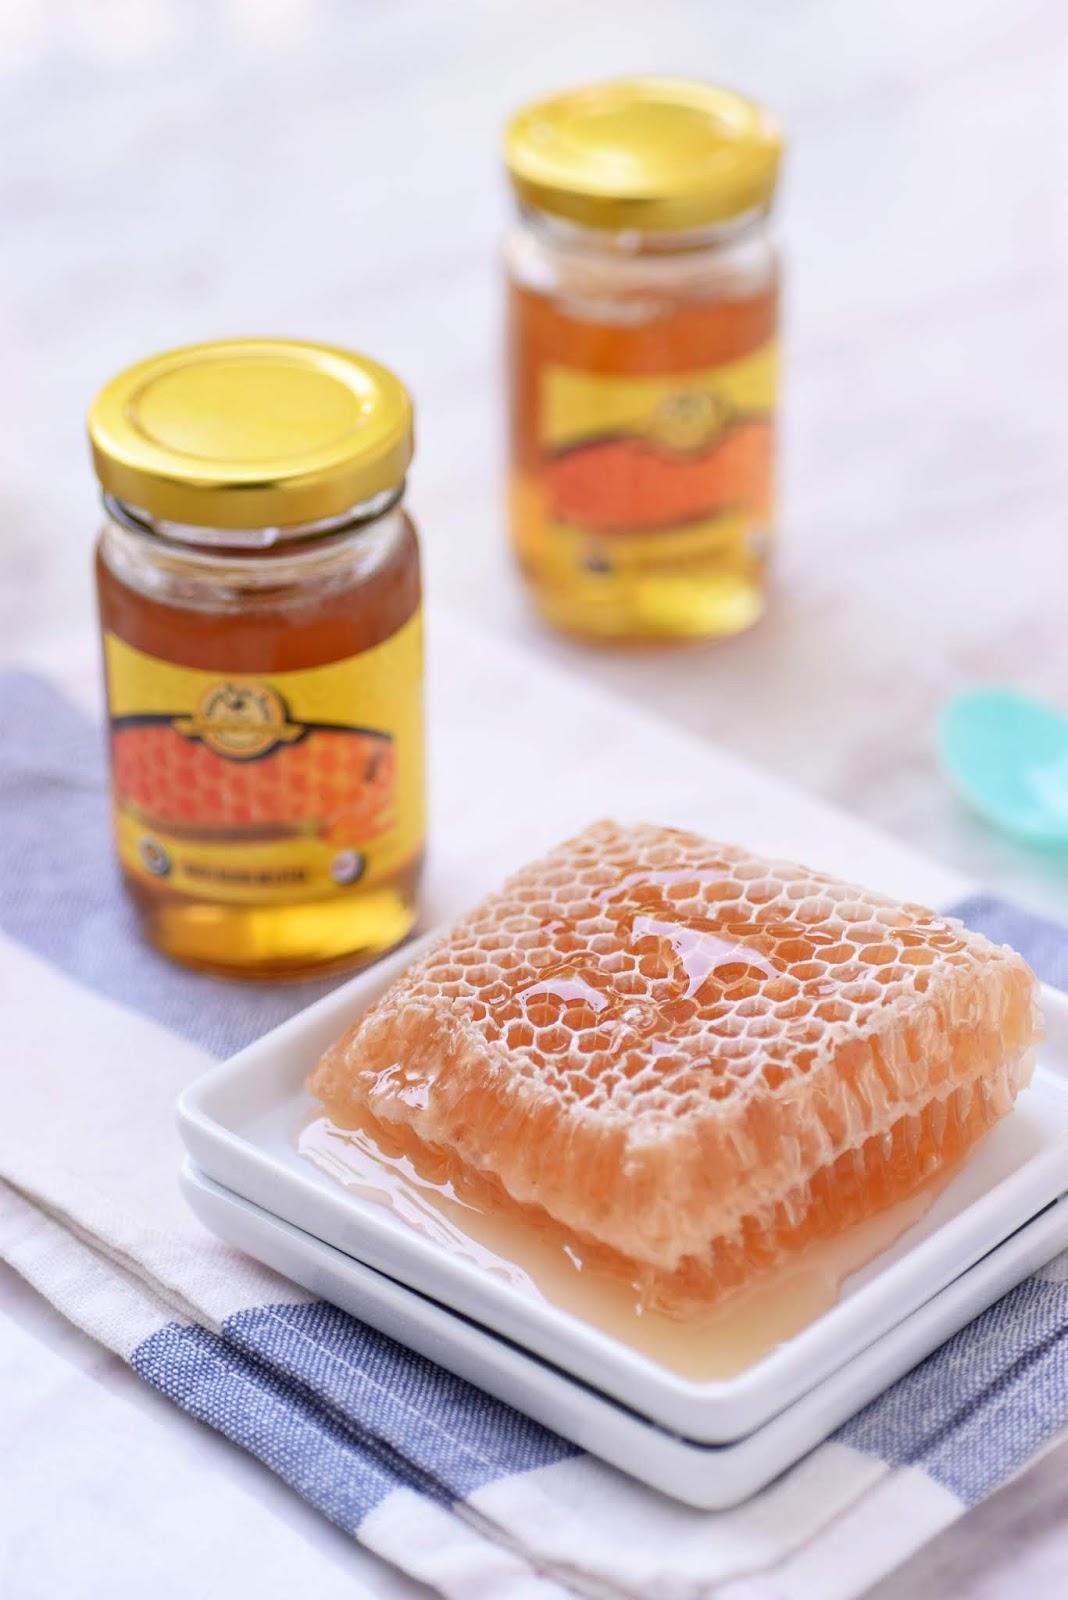 Sarang lebah